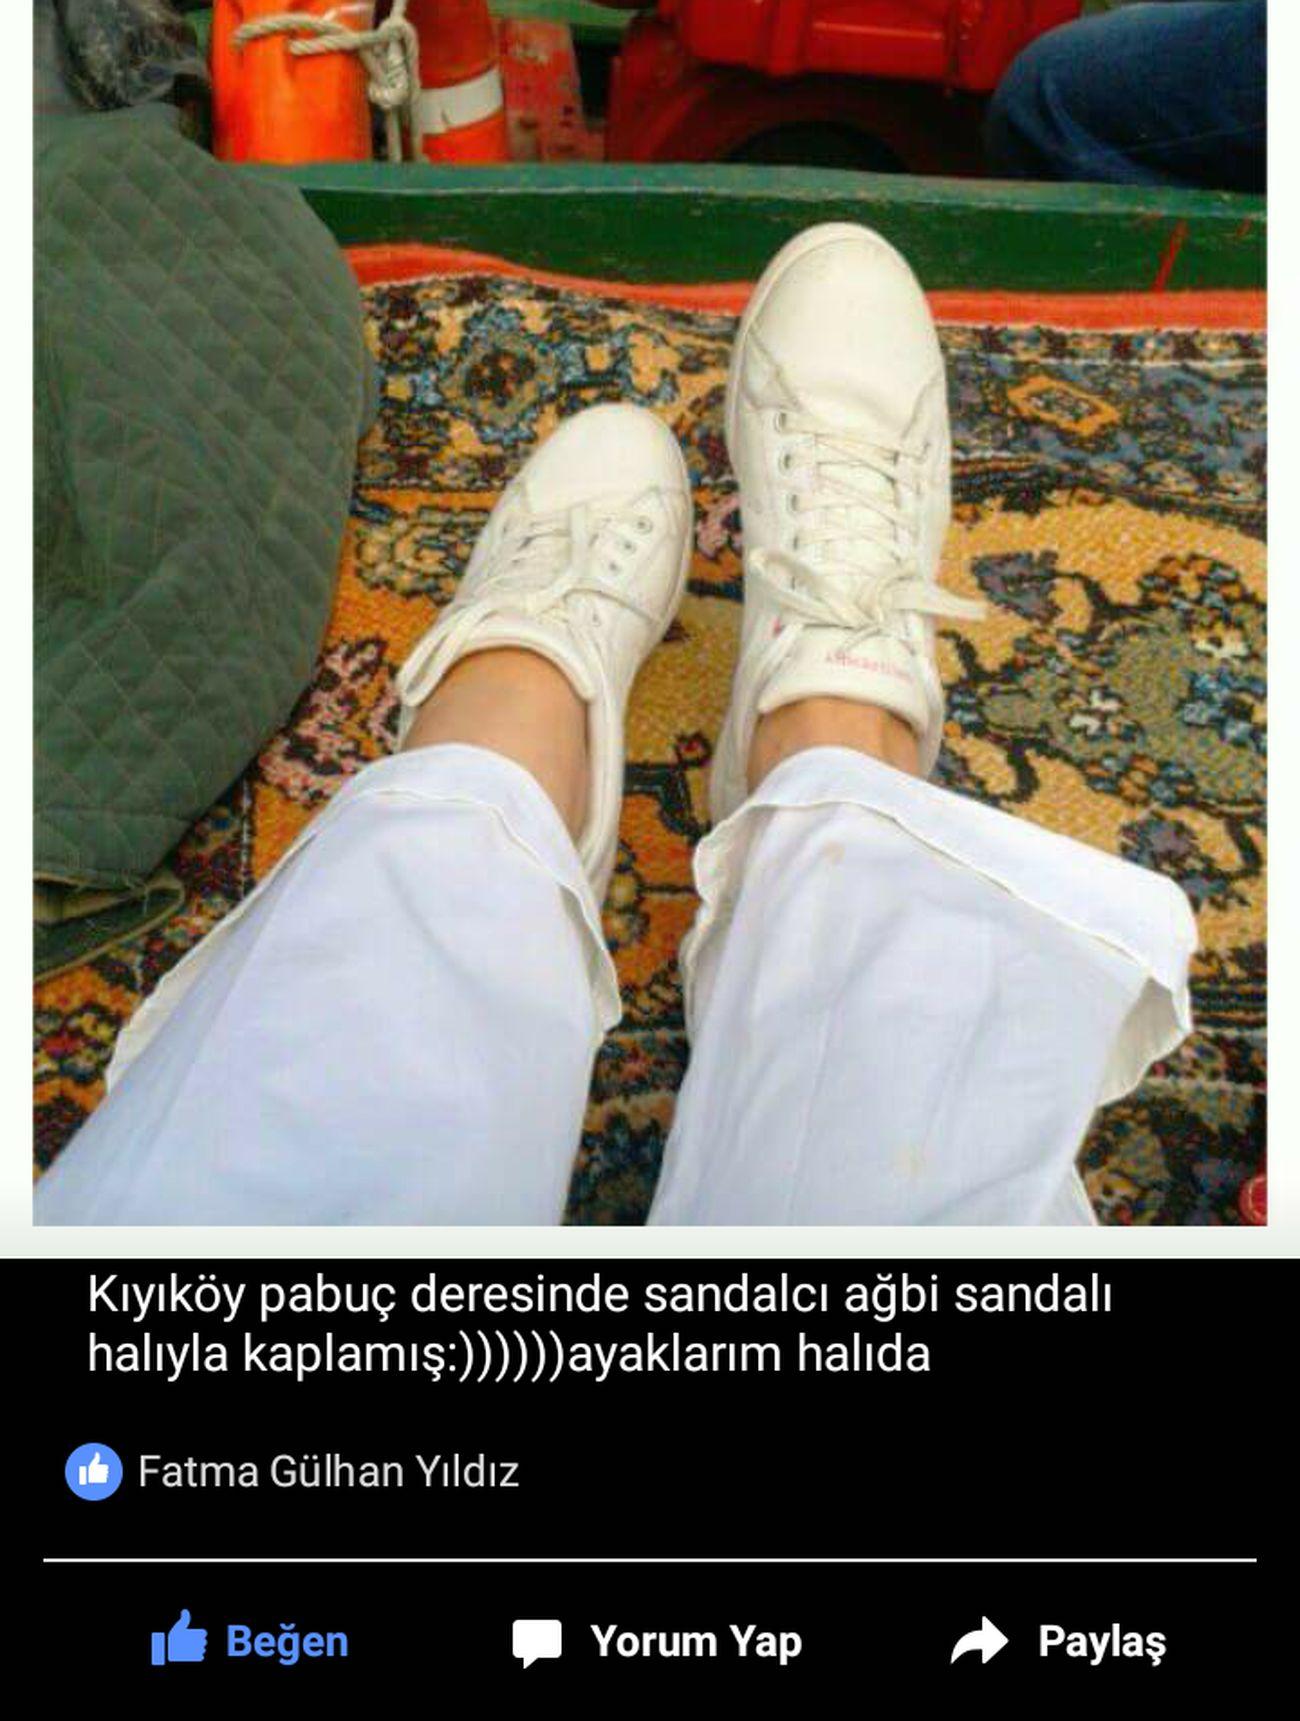 Sandal Kıyıköy Pabuç Deresi Korkak Ben😯